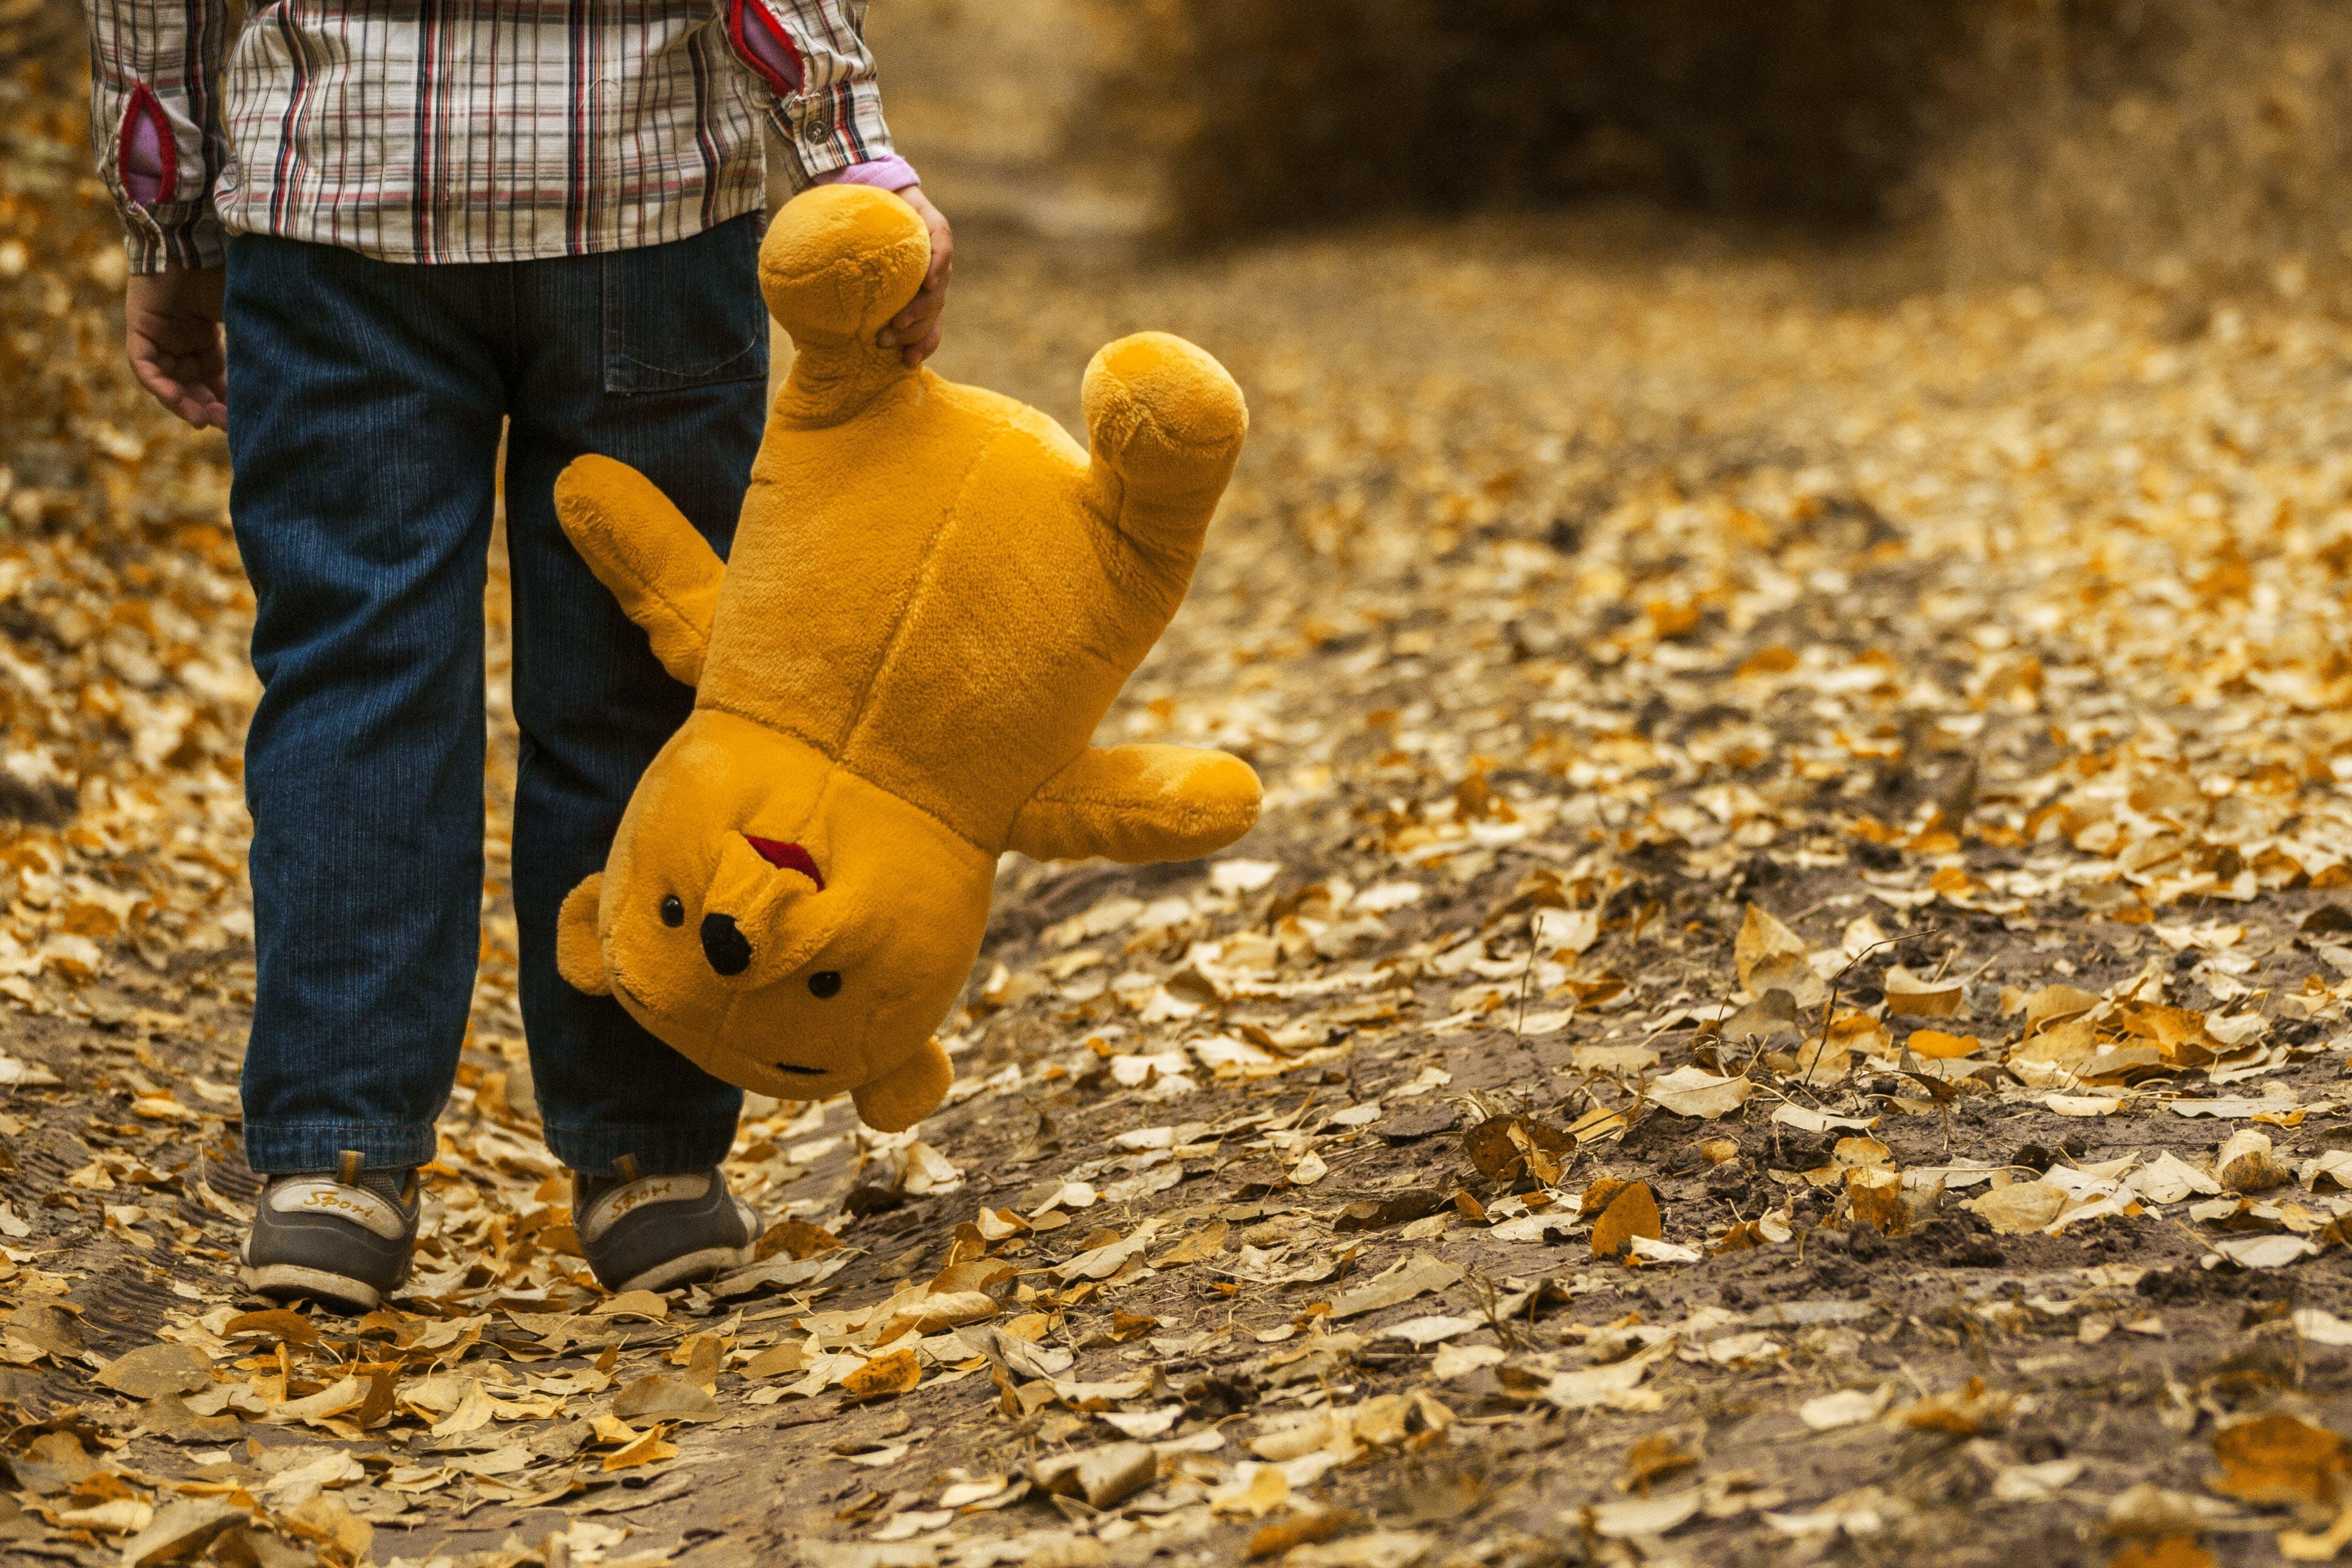 Gratis stockfoto met droge bladeren, kid, kind, knuffelbeer